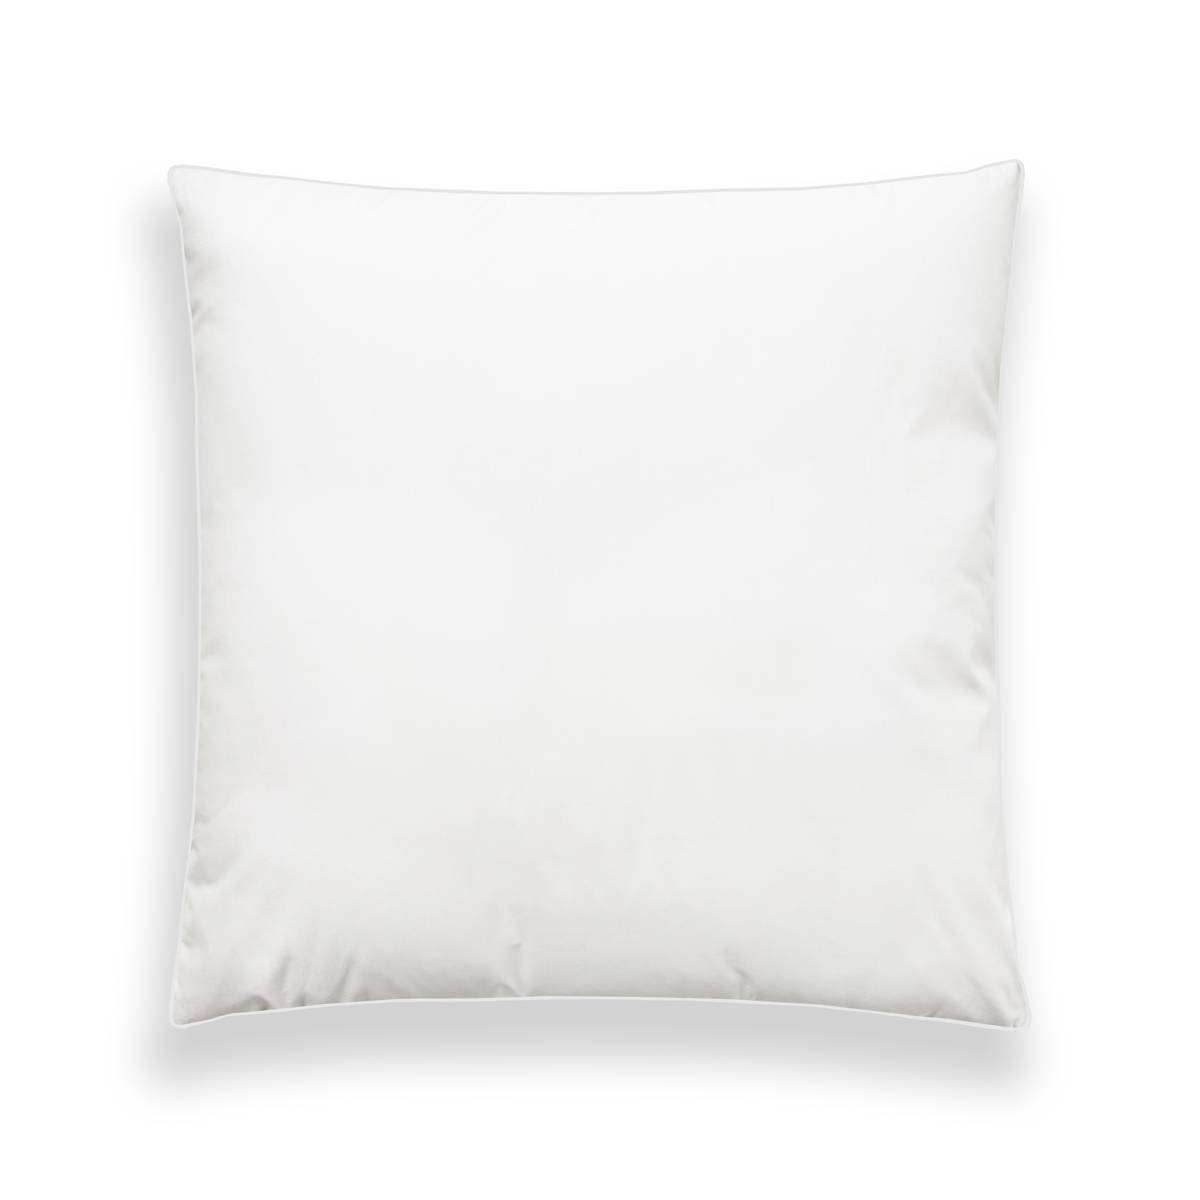 WAKE ME GREEN Oreiller FERME 10% Duvet Anti-acariens - Coton Bio  50x75 cm